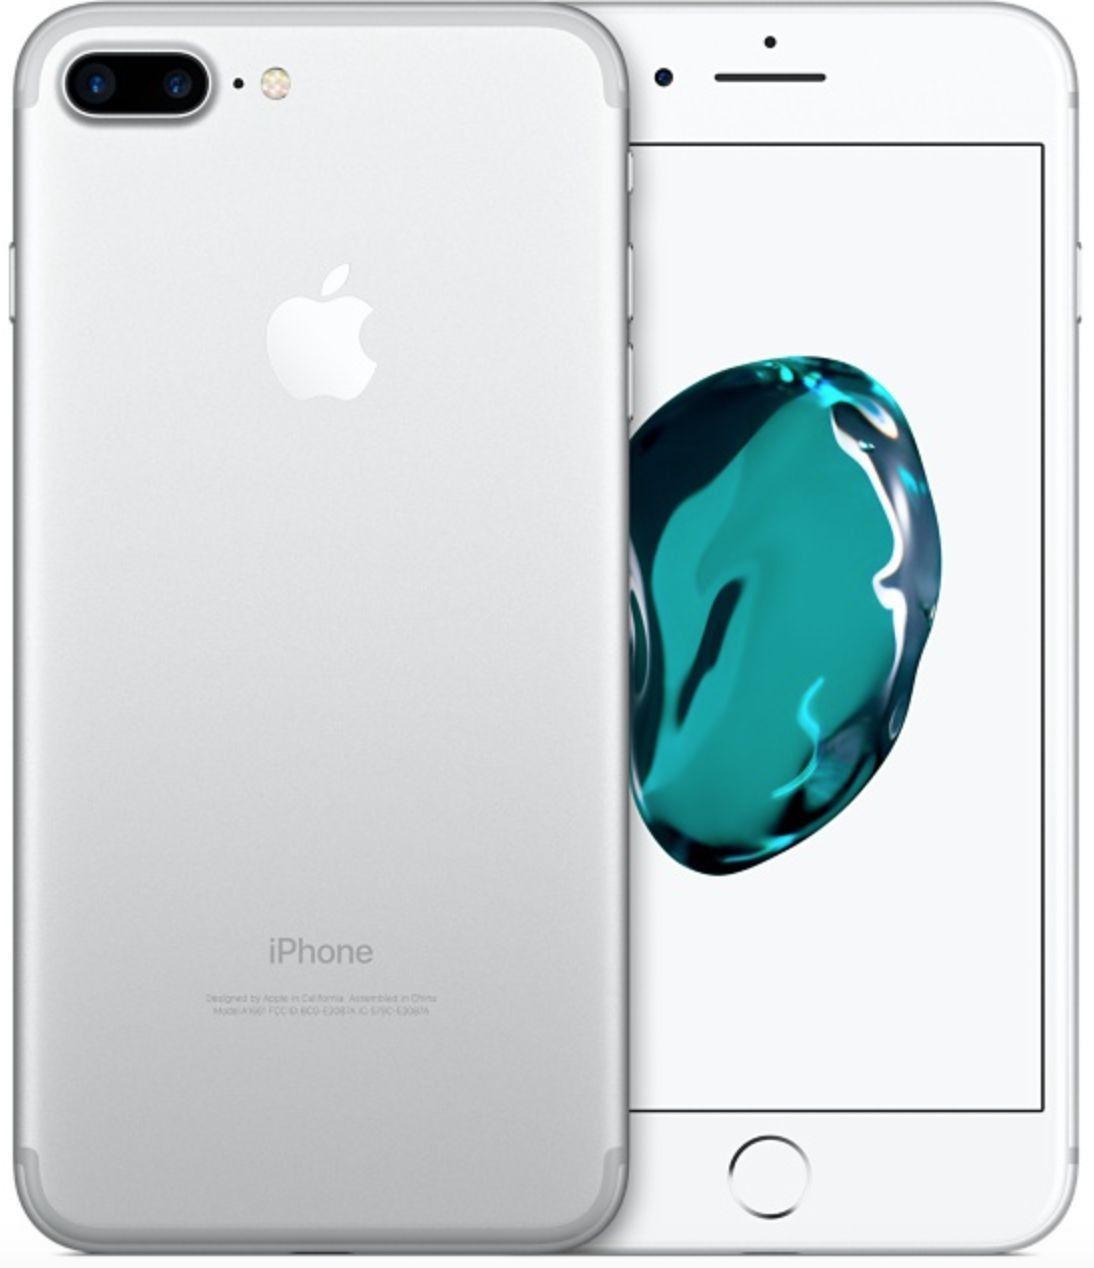 apple iphone 7 plus 128gb schwarz gold wow. Black Bedroom Furniture Sets. Home Design Ideas